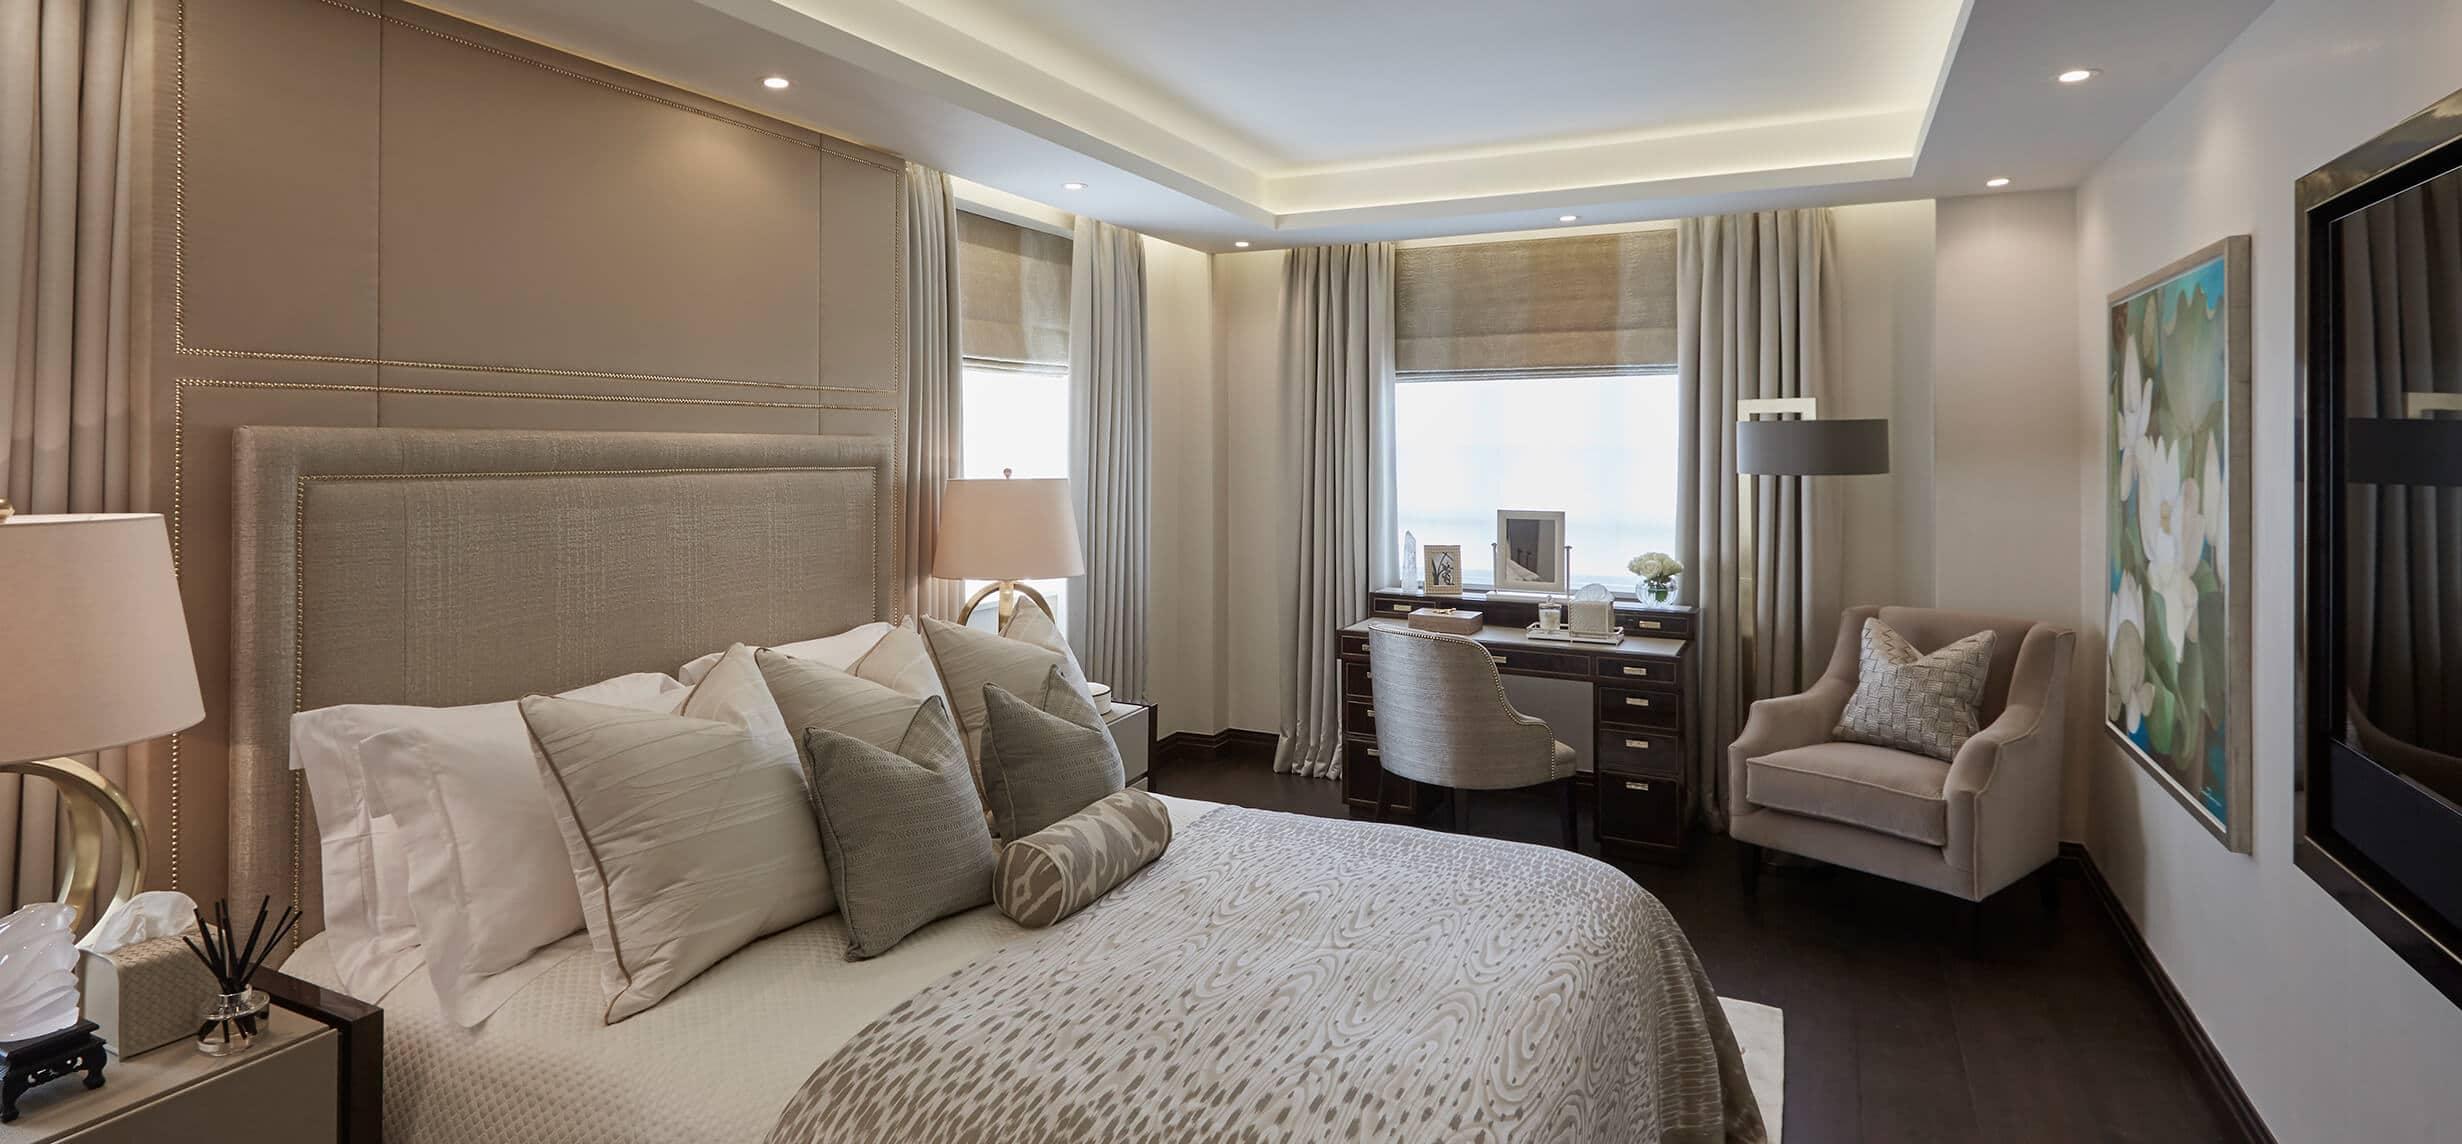 Luxury interior design project in Hyde Park